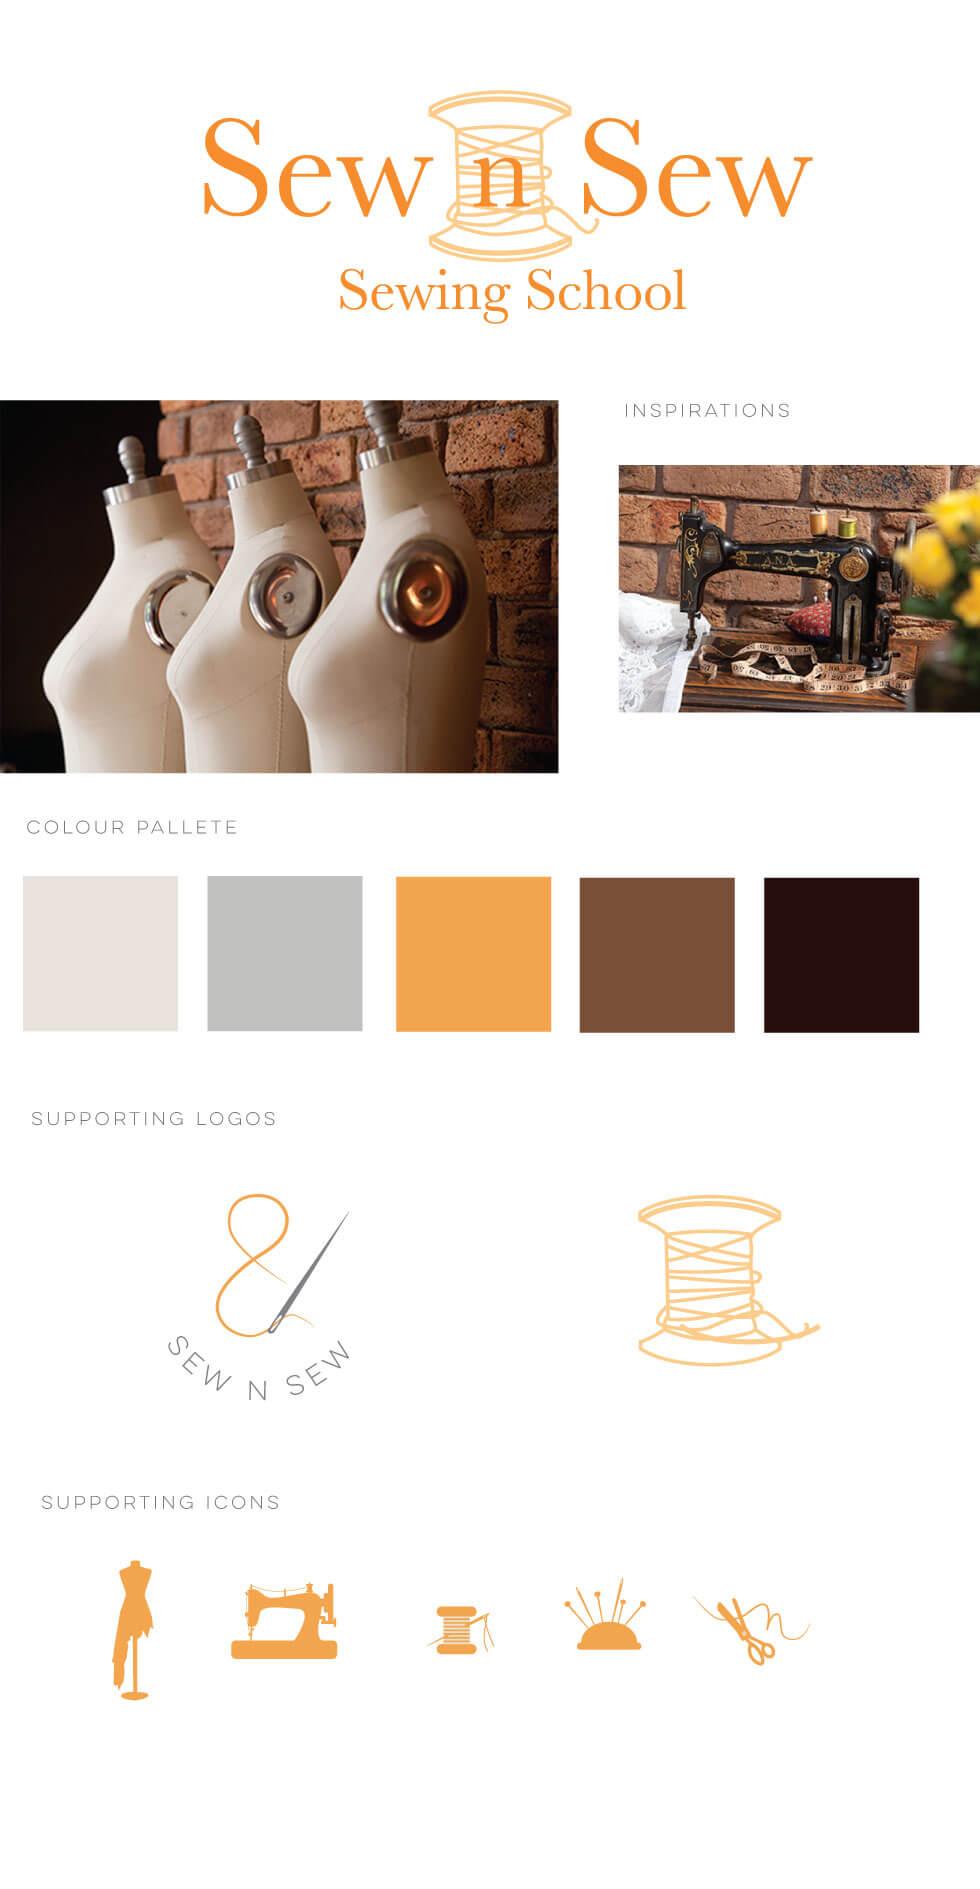 Sew n Sew Sewing School Logo and Branding Design